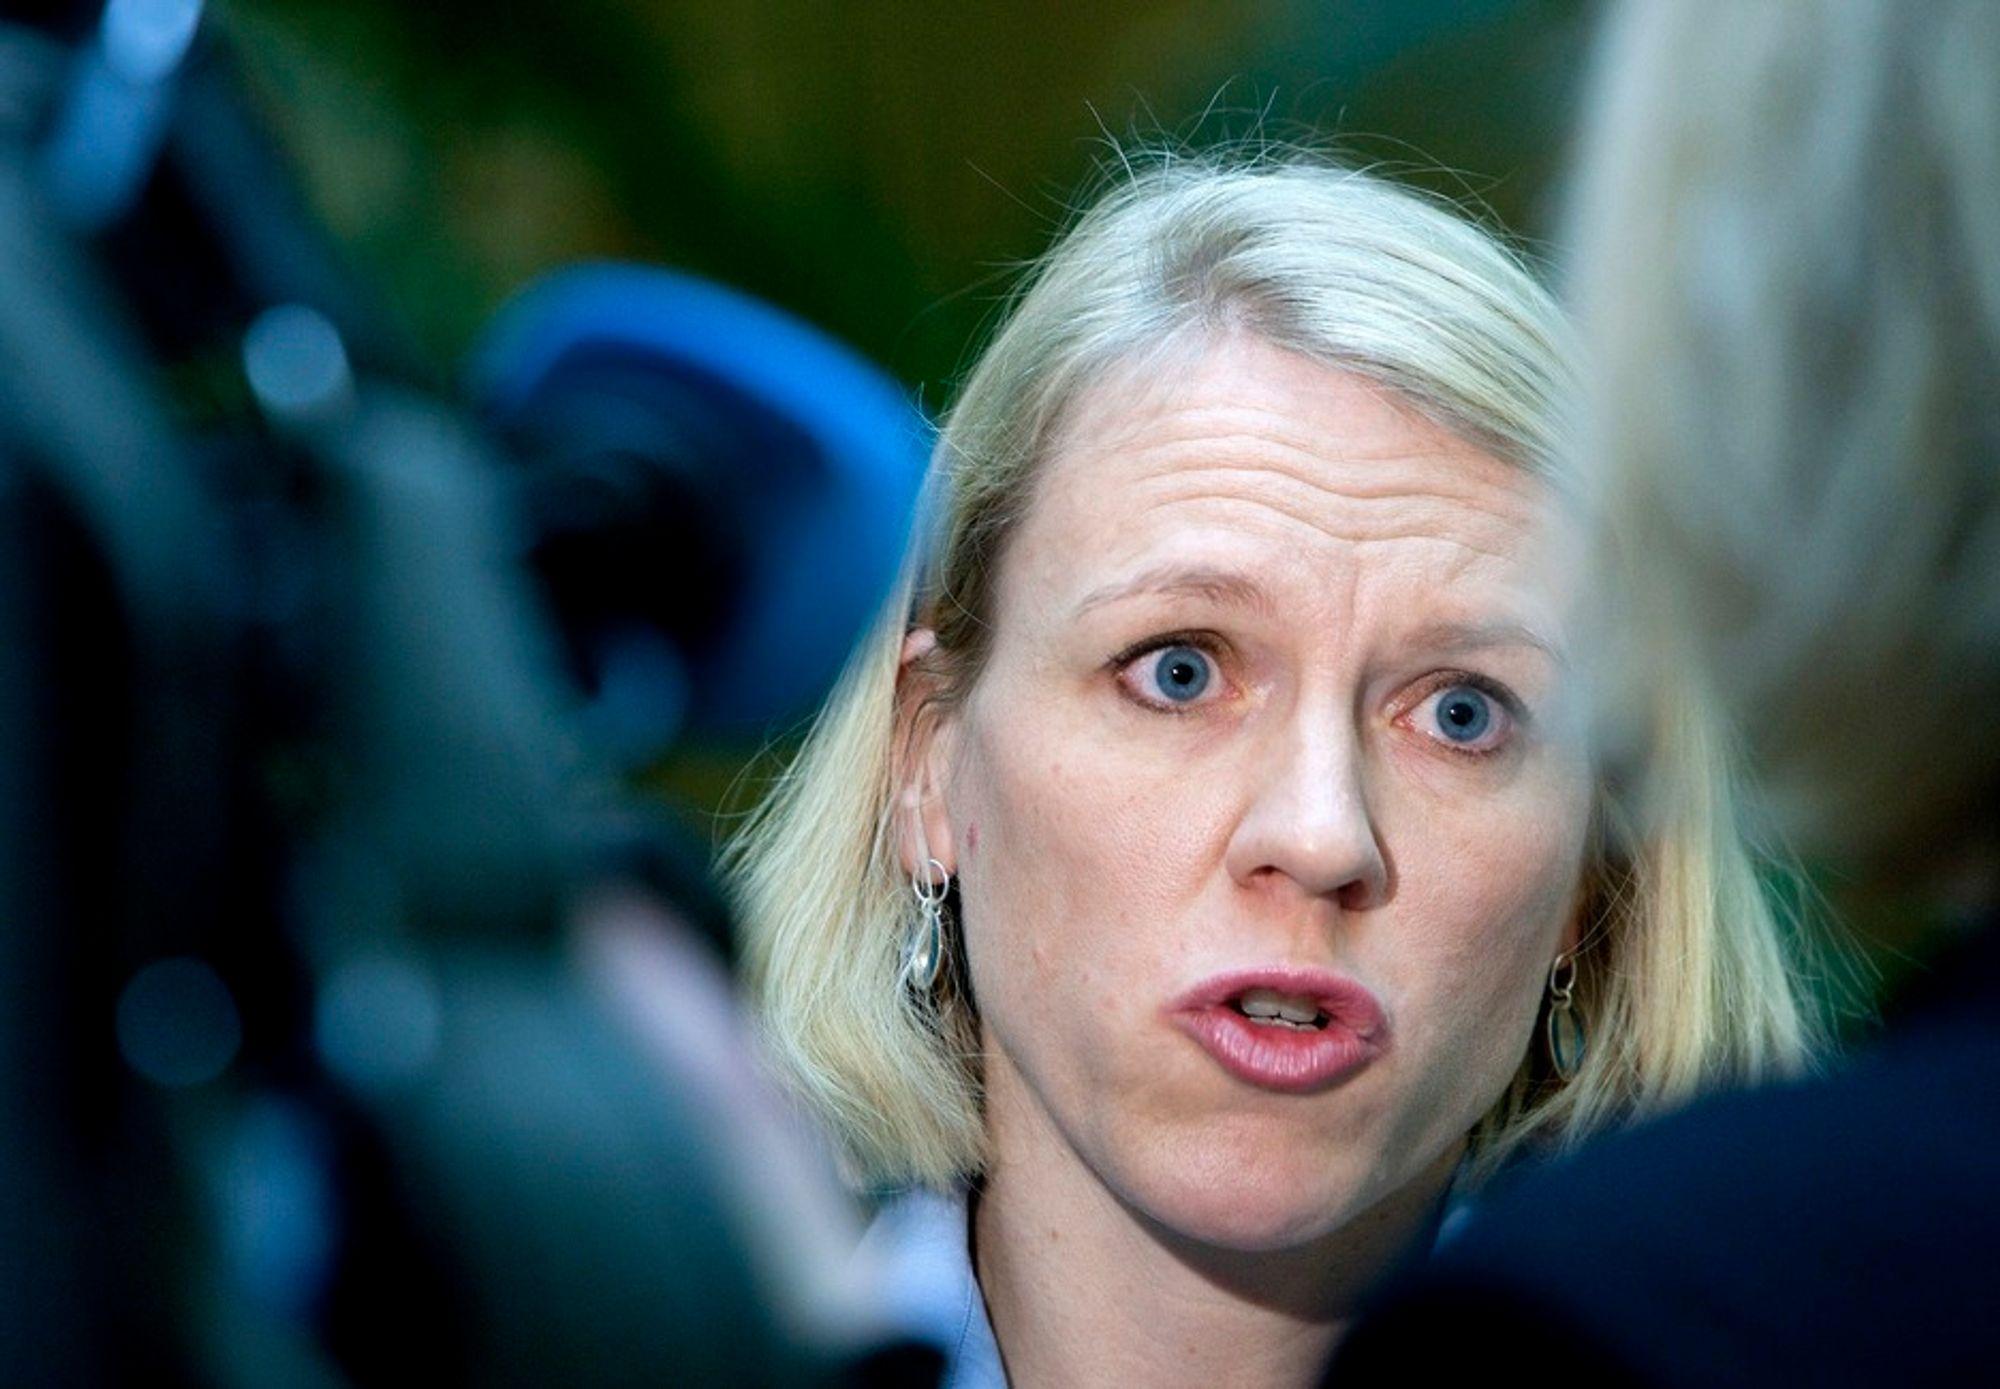 Fornøyd: Arbeidsminister Anniken Huitfeldt.